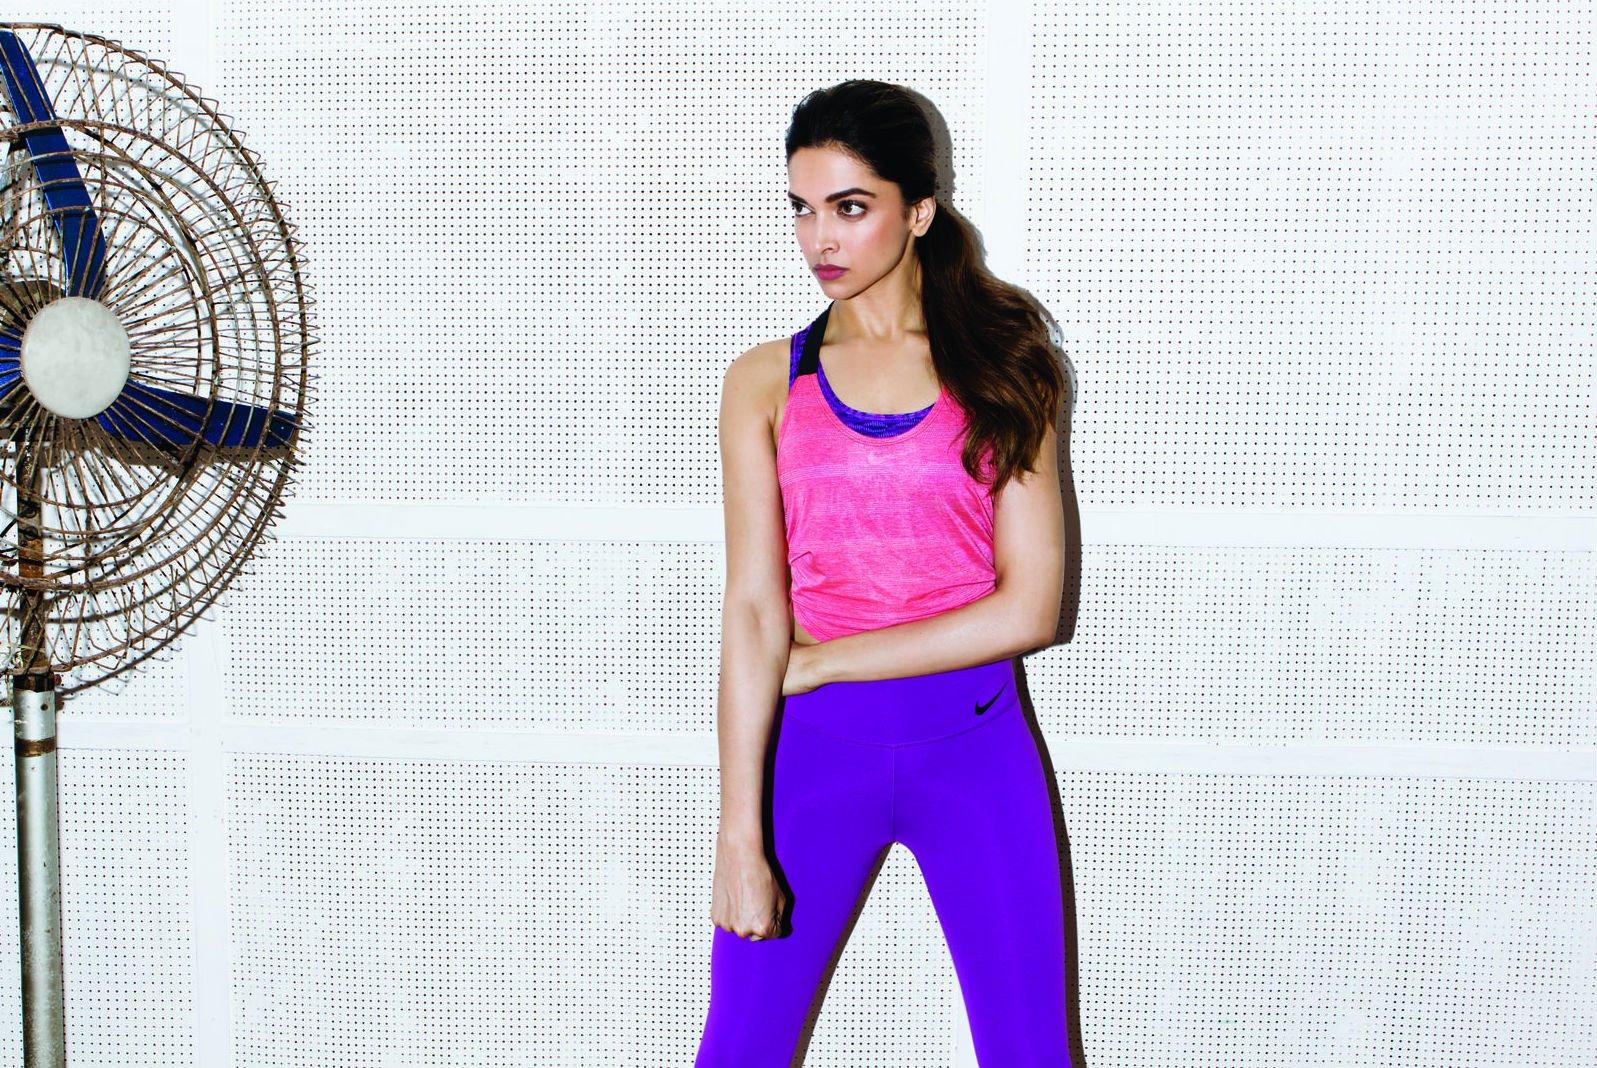 India-female-athletes-Nike-video-BODY-Deepika.jpg